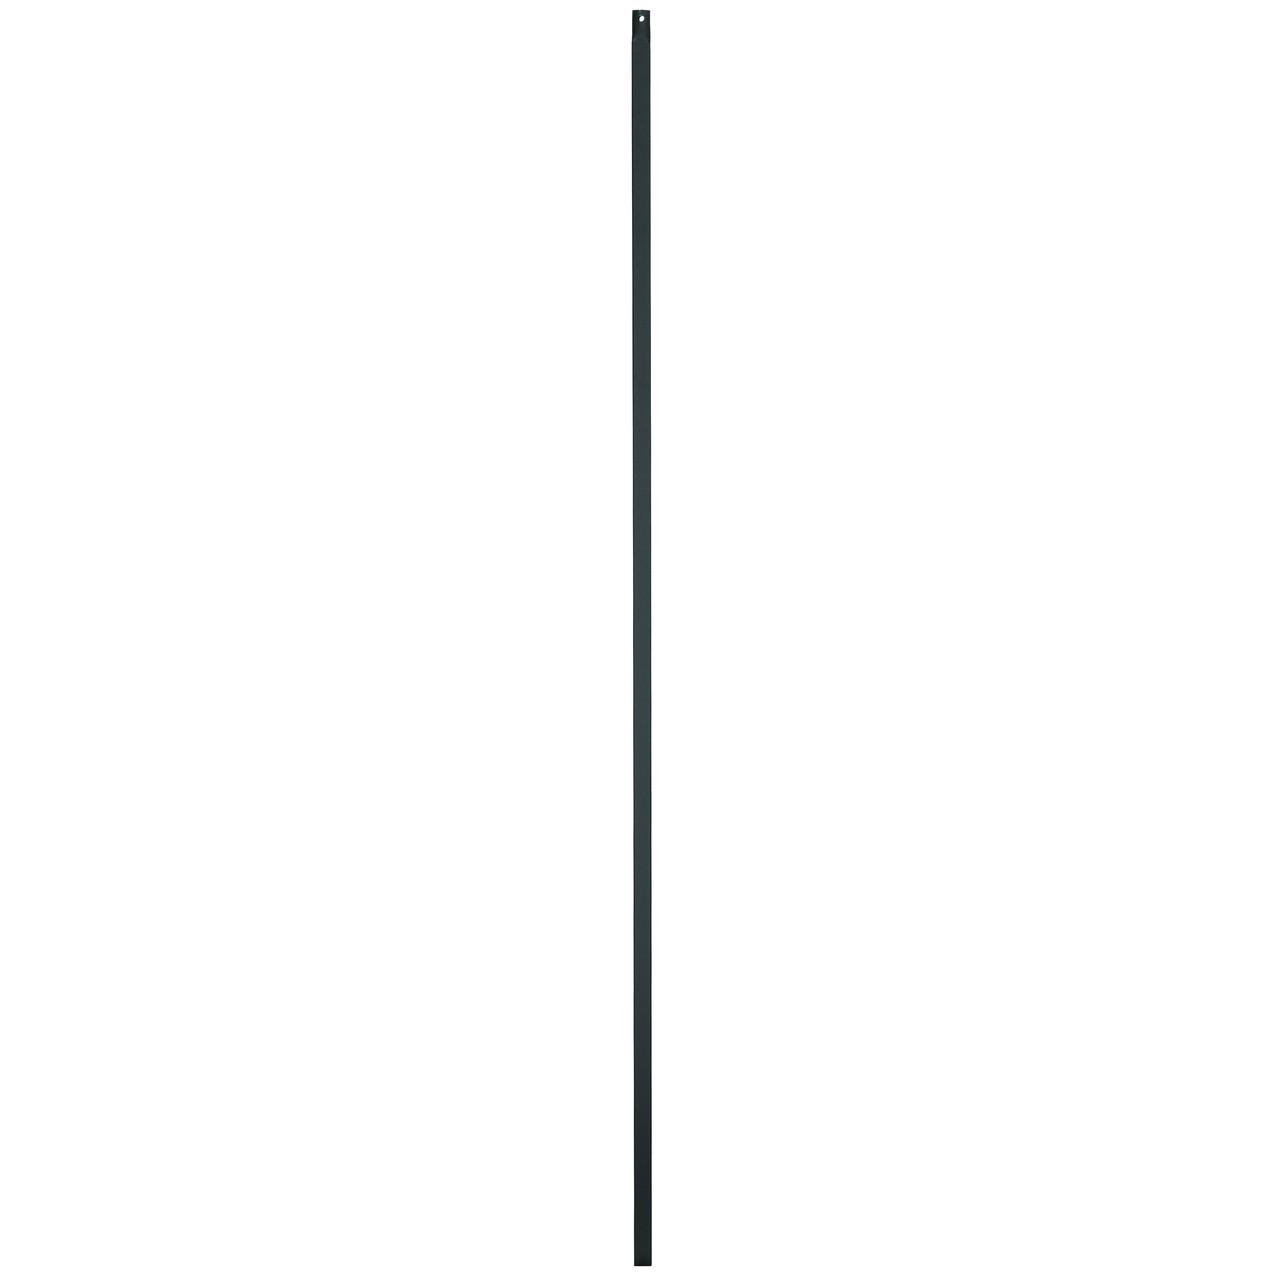 2G01 16mm Plain Bar, Tubular Steel